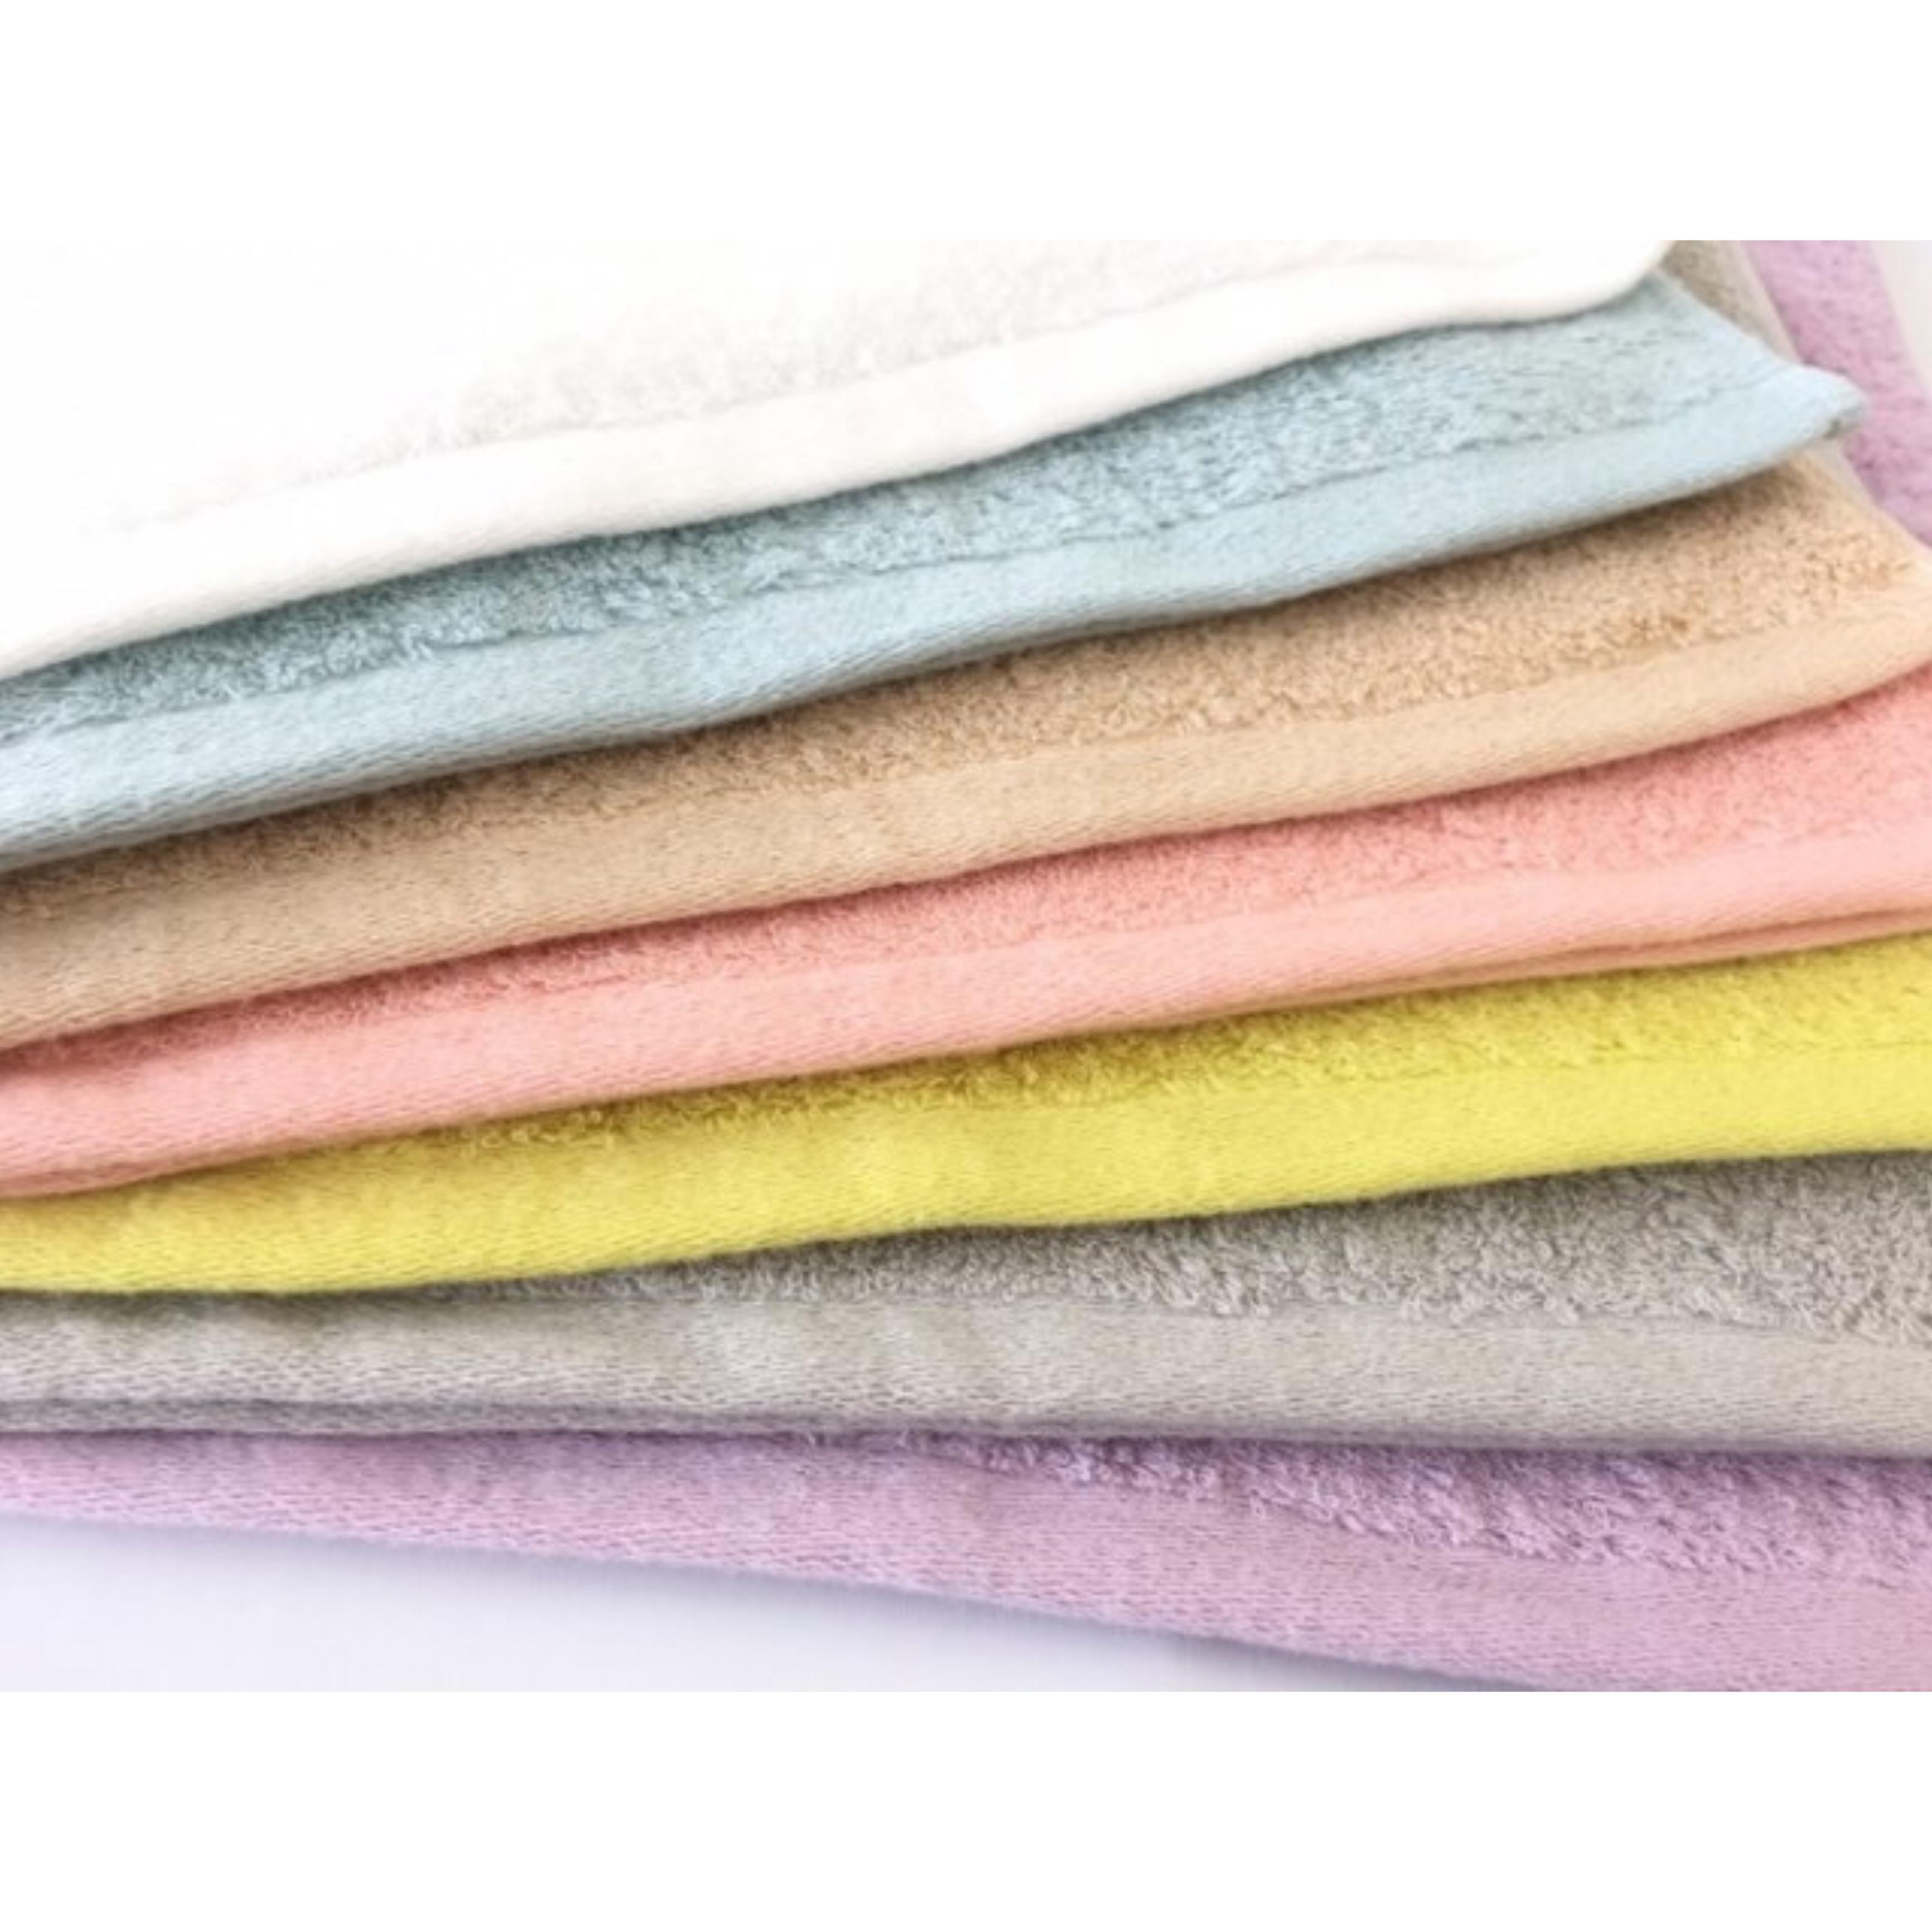 Cherie (シェリー) 色を選べるバスタオル 3枚組 今治タオル 中厚 無地 カラー